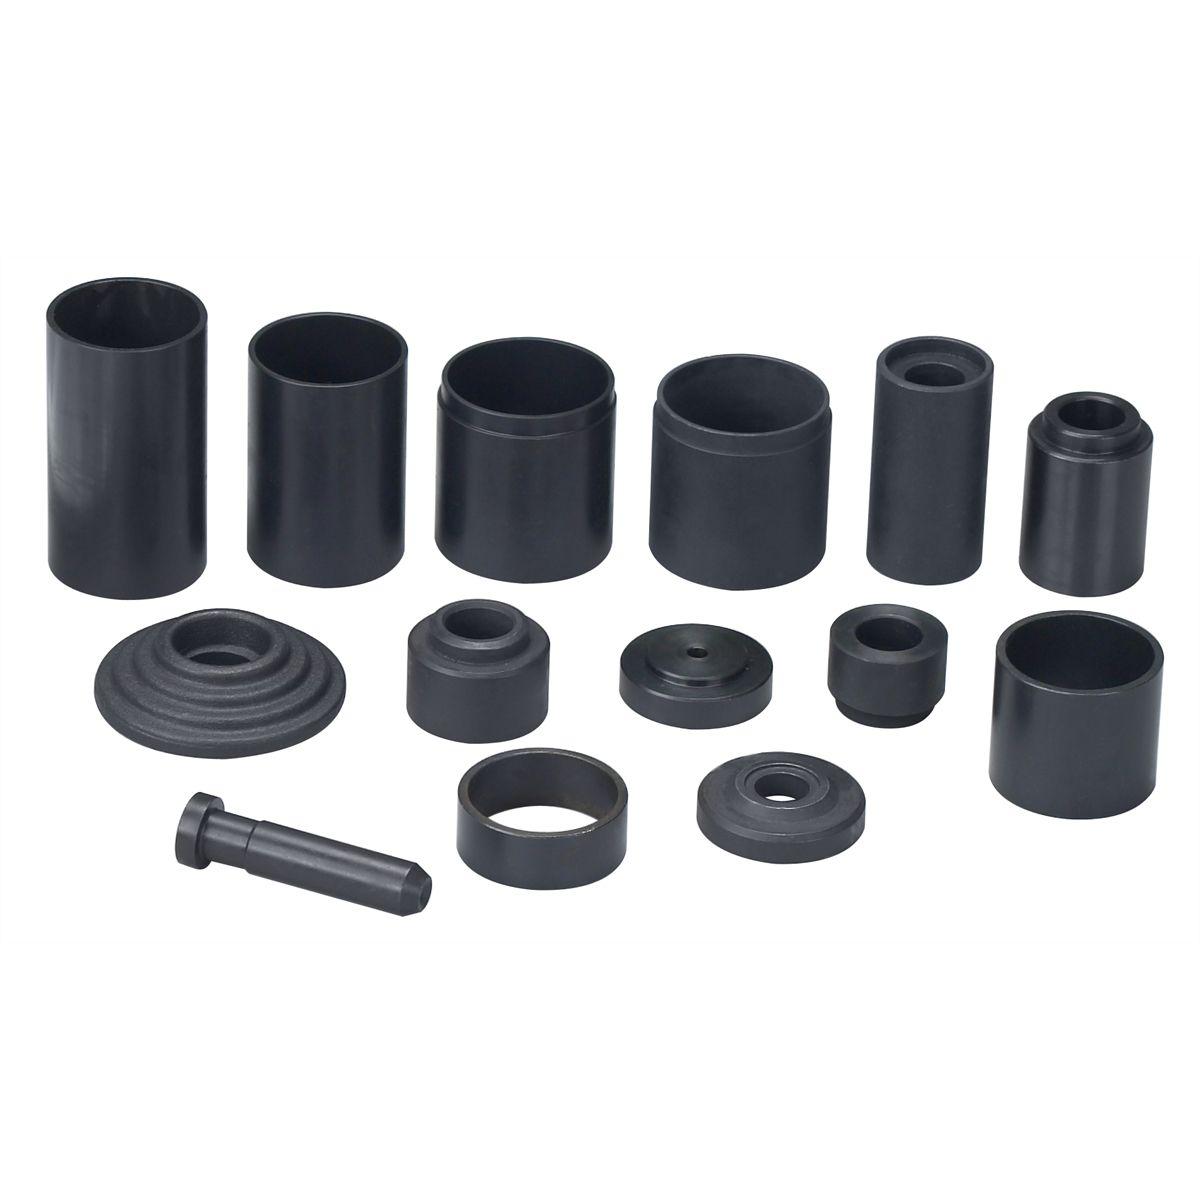 Ball Joint Car >> Asian Import Car Ball Joint Adapter Set